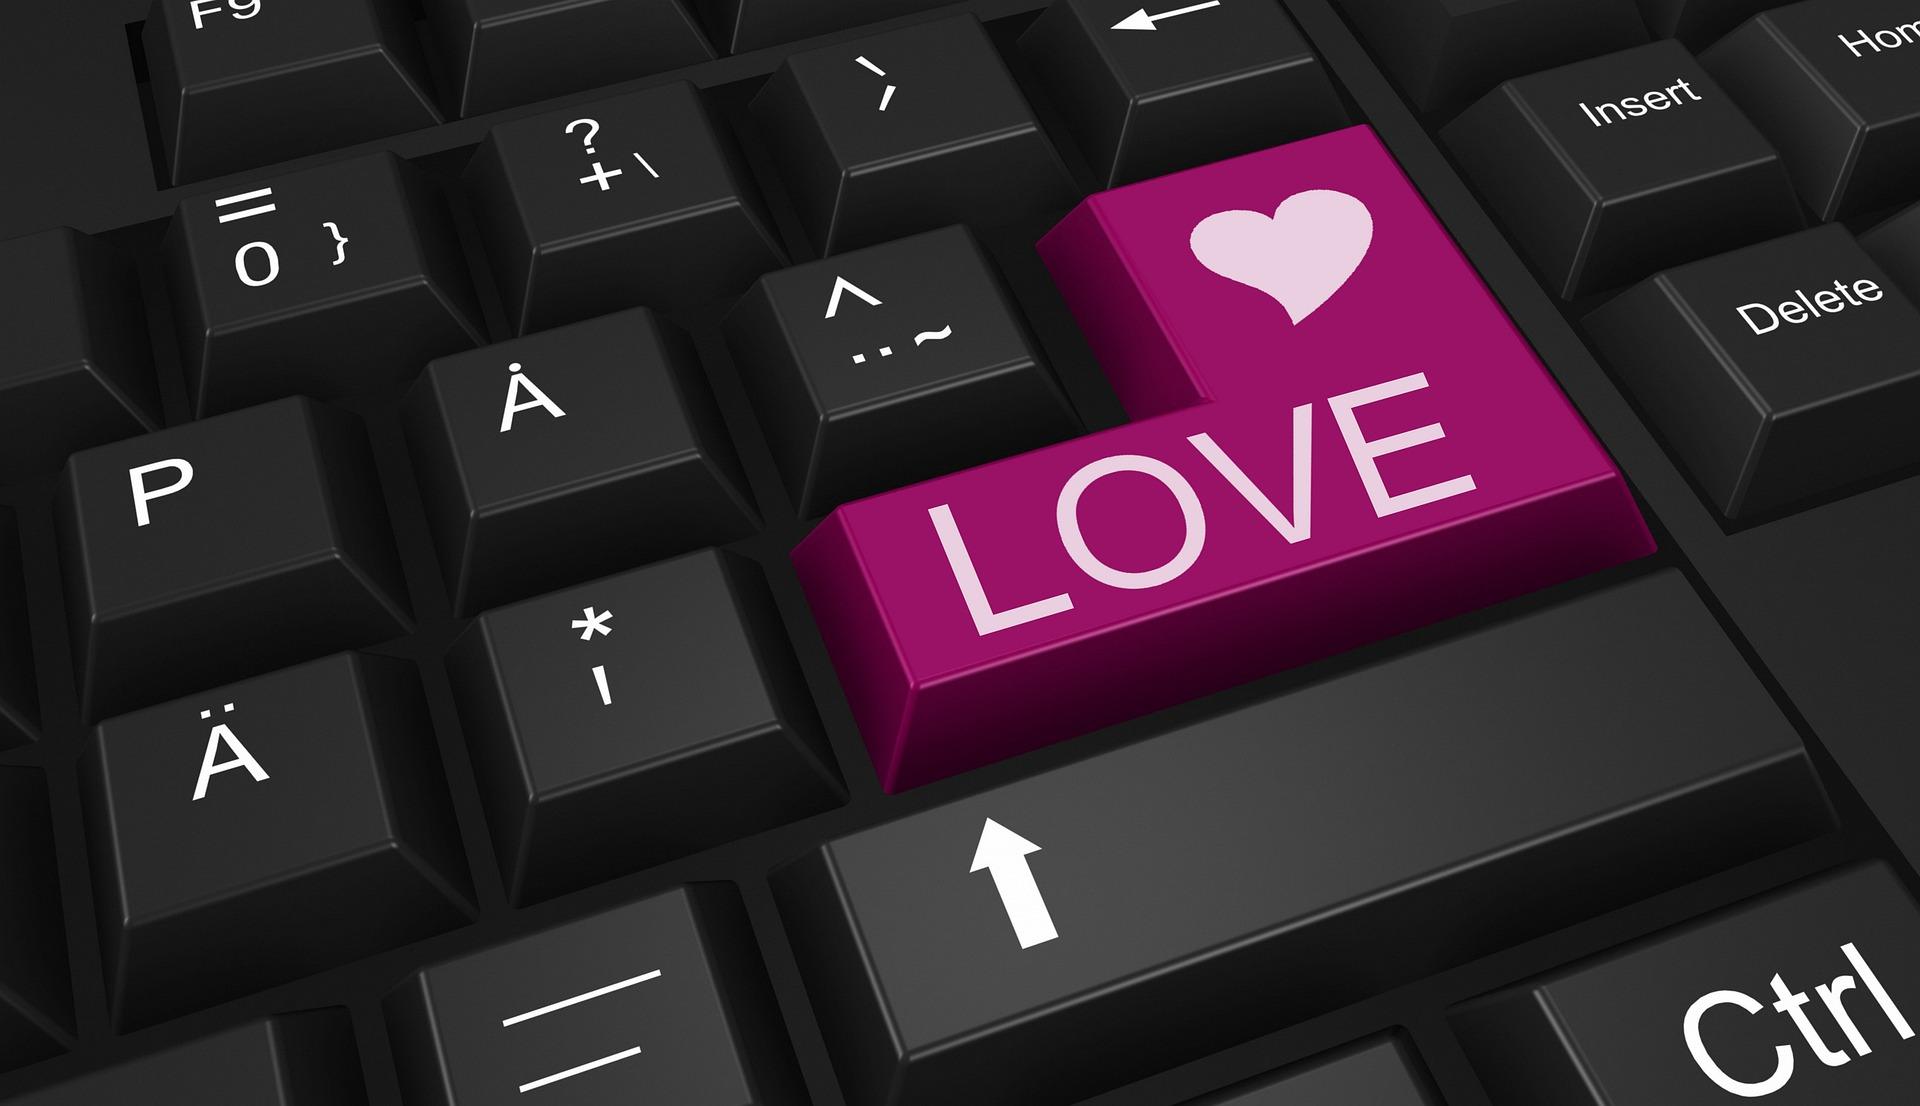 Ehevorbereitungsseminar online